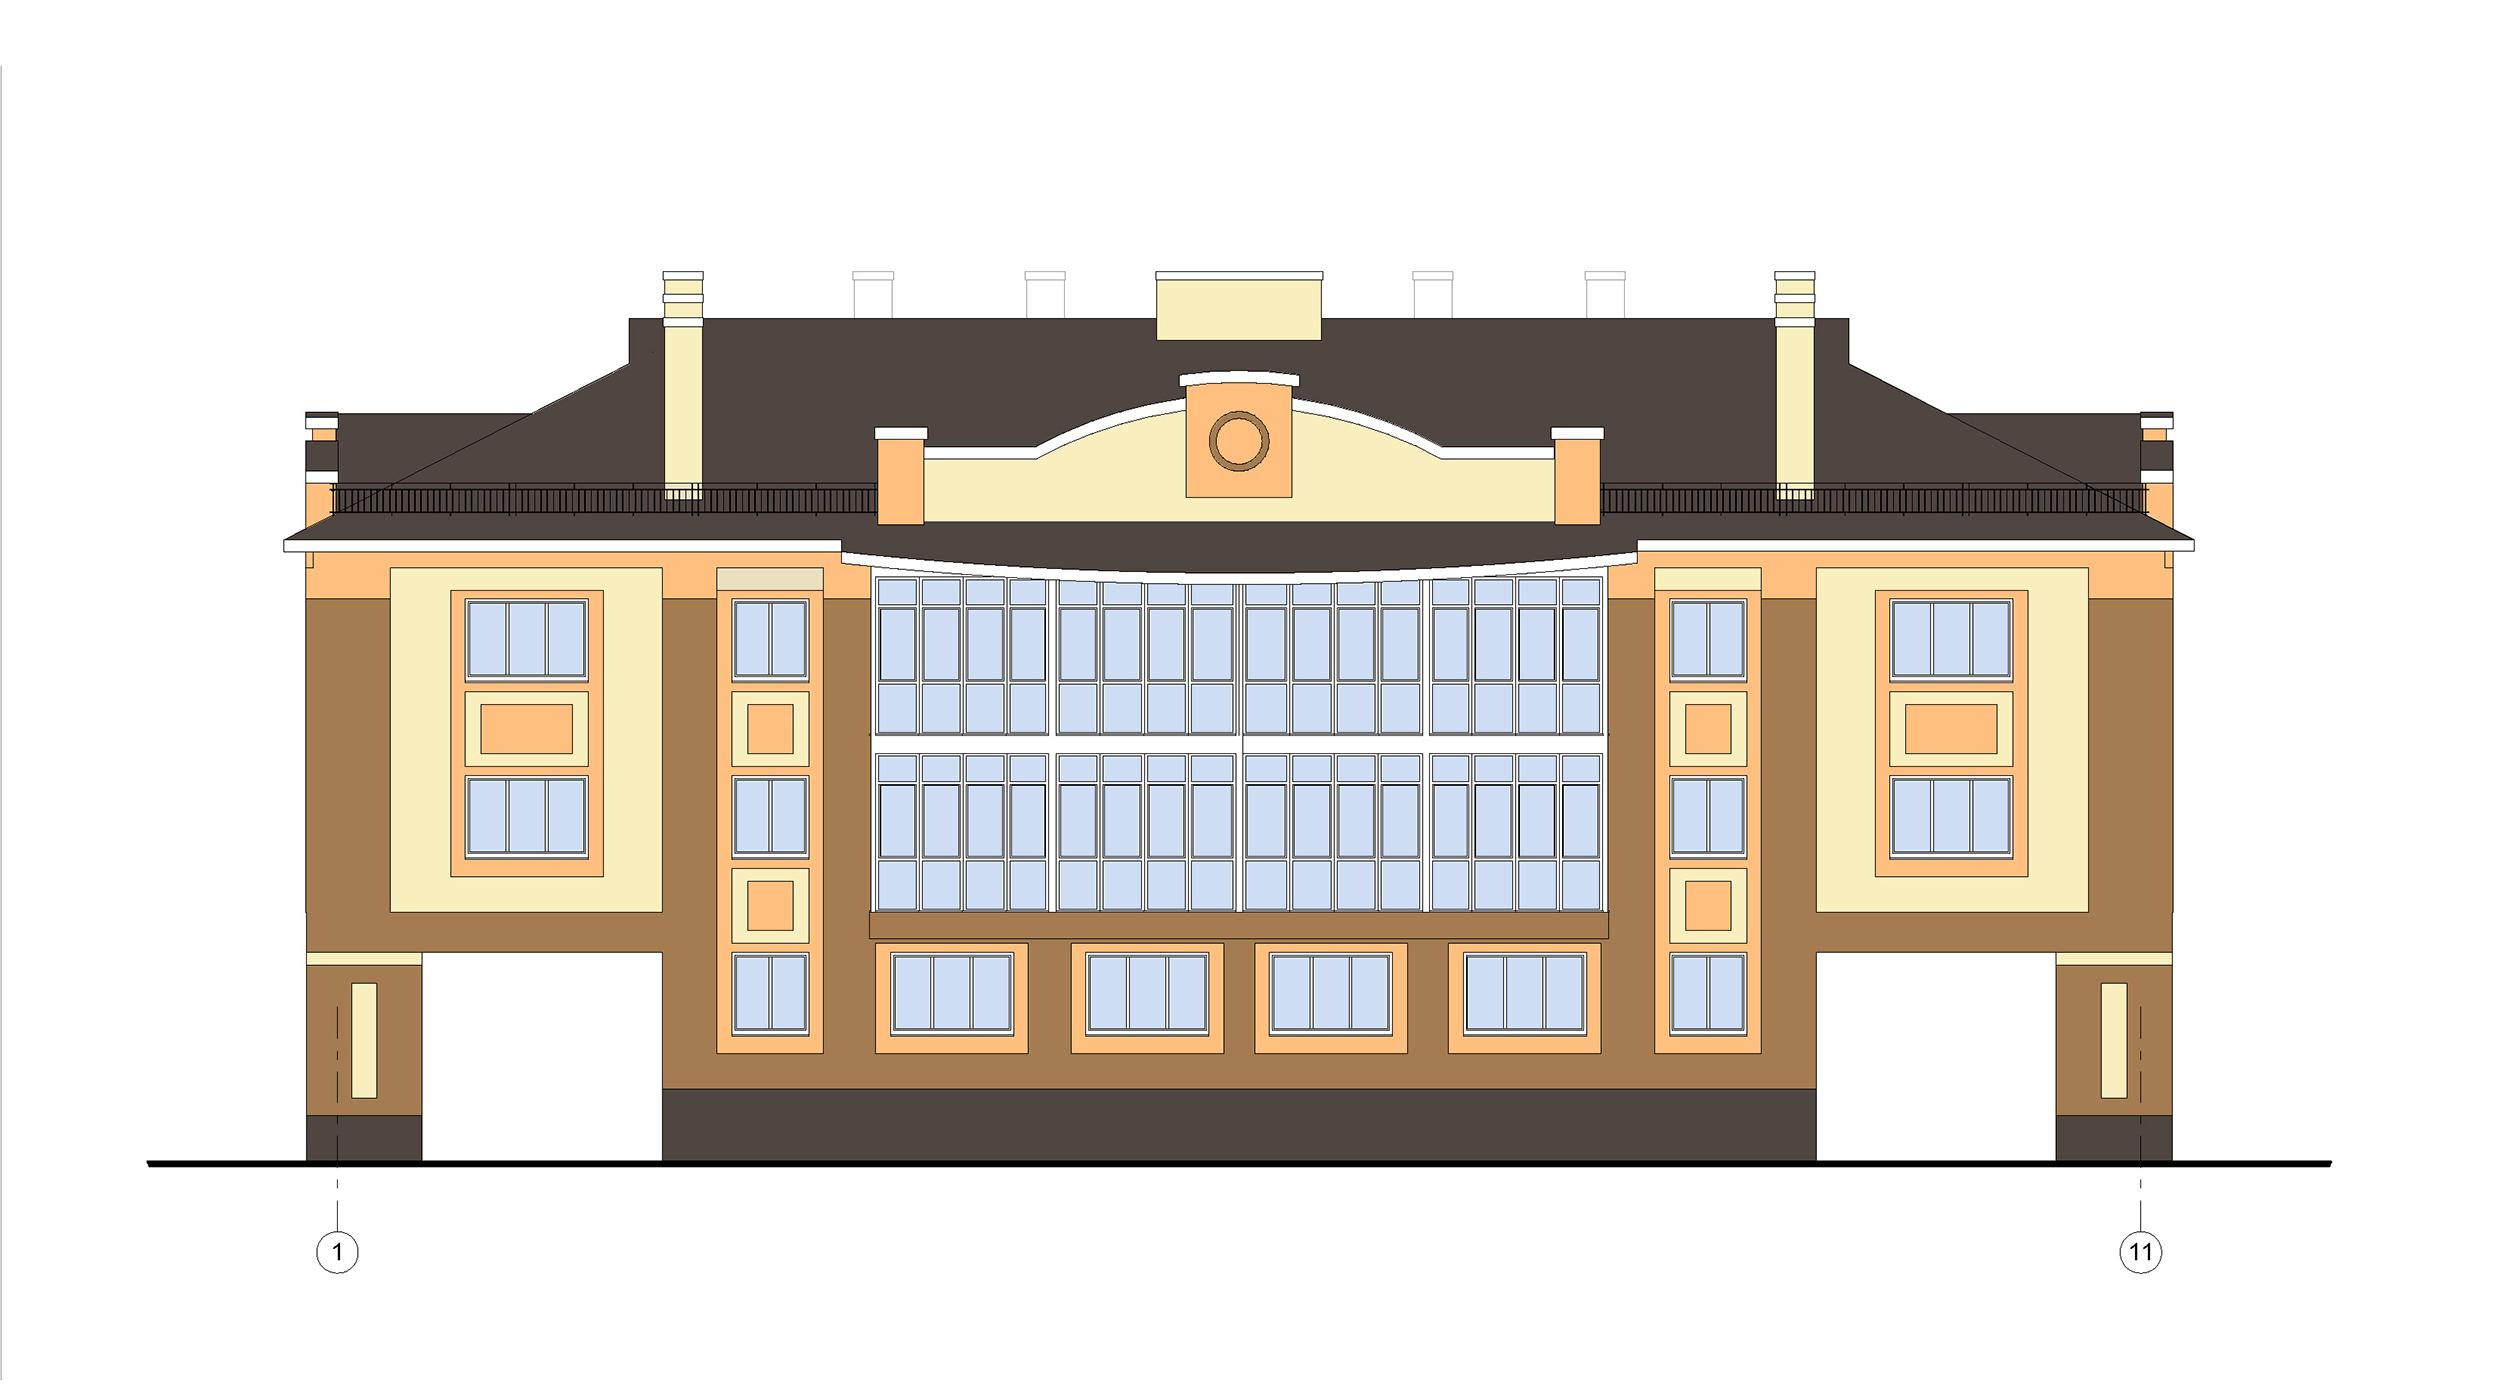 Проект 3-х этажного многоквартирного дома. Фасад в осях 1-11